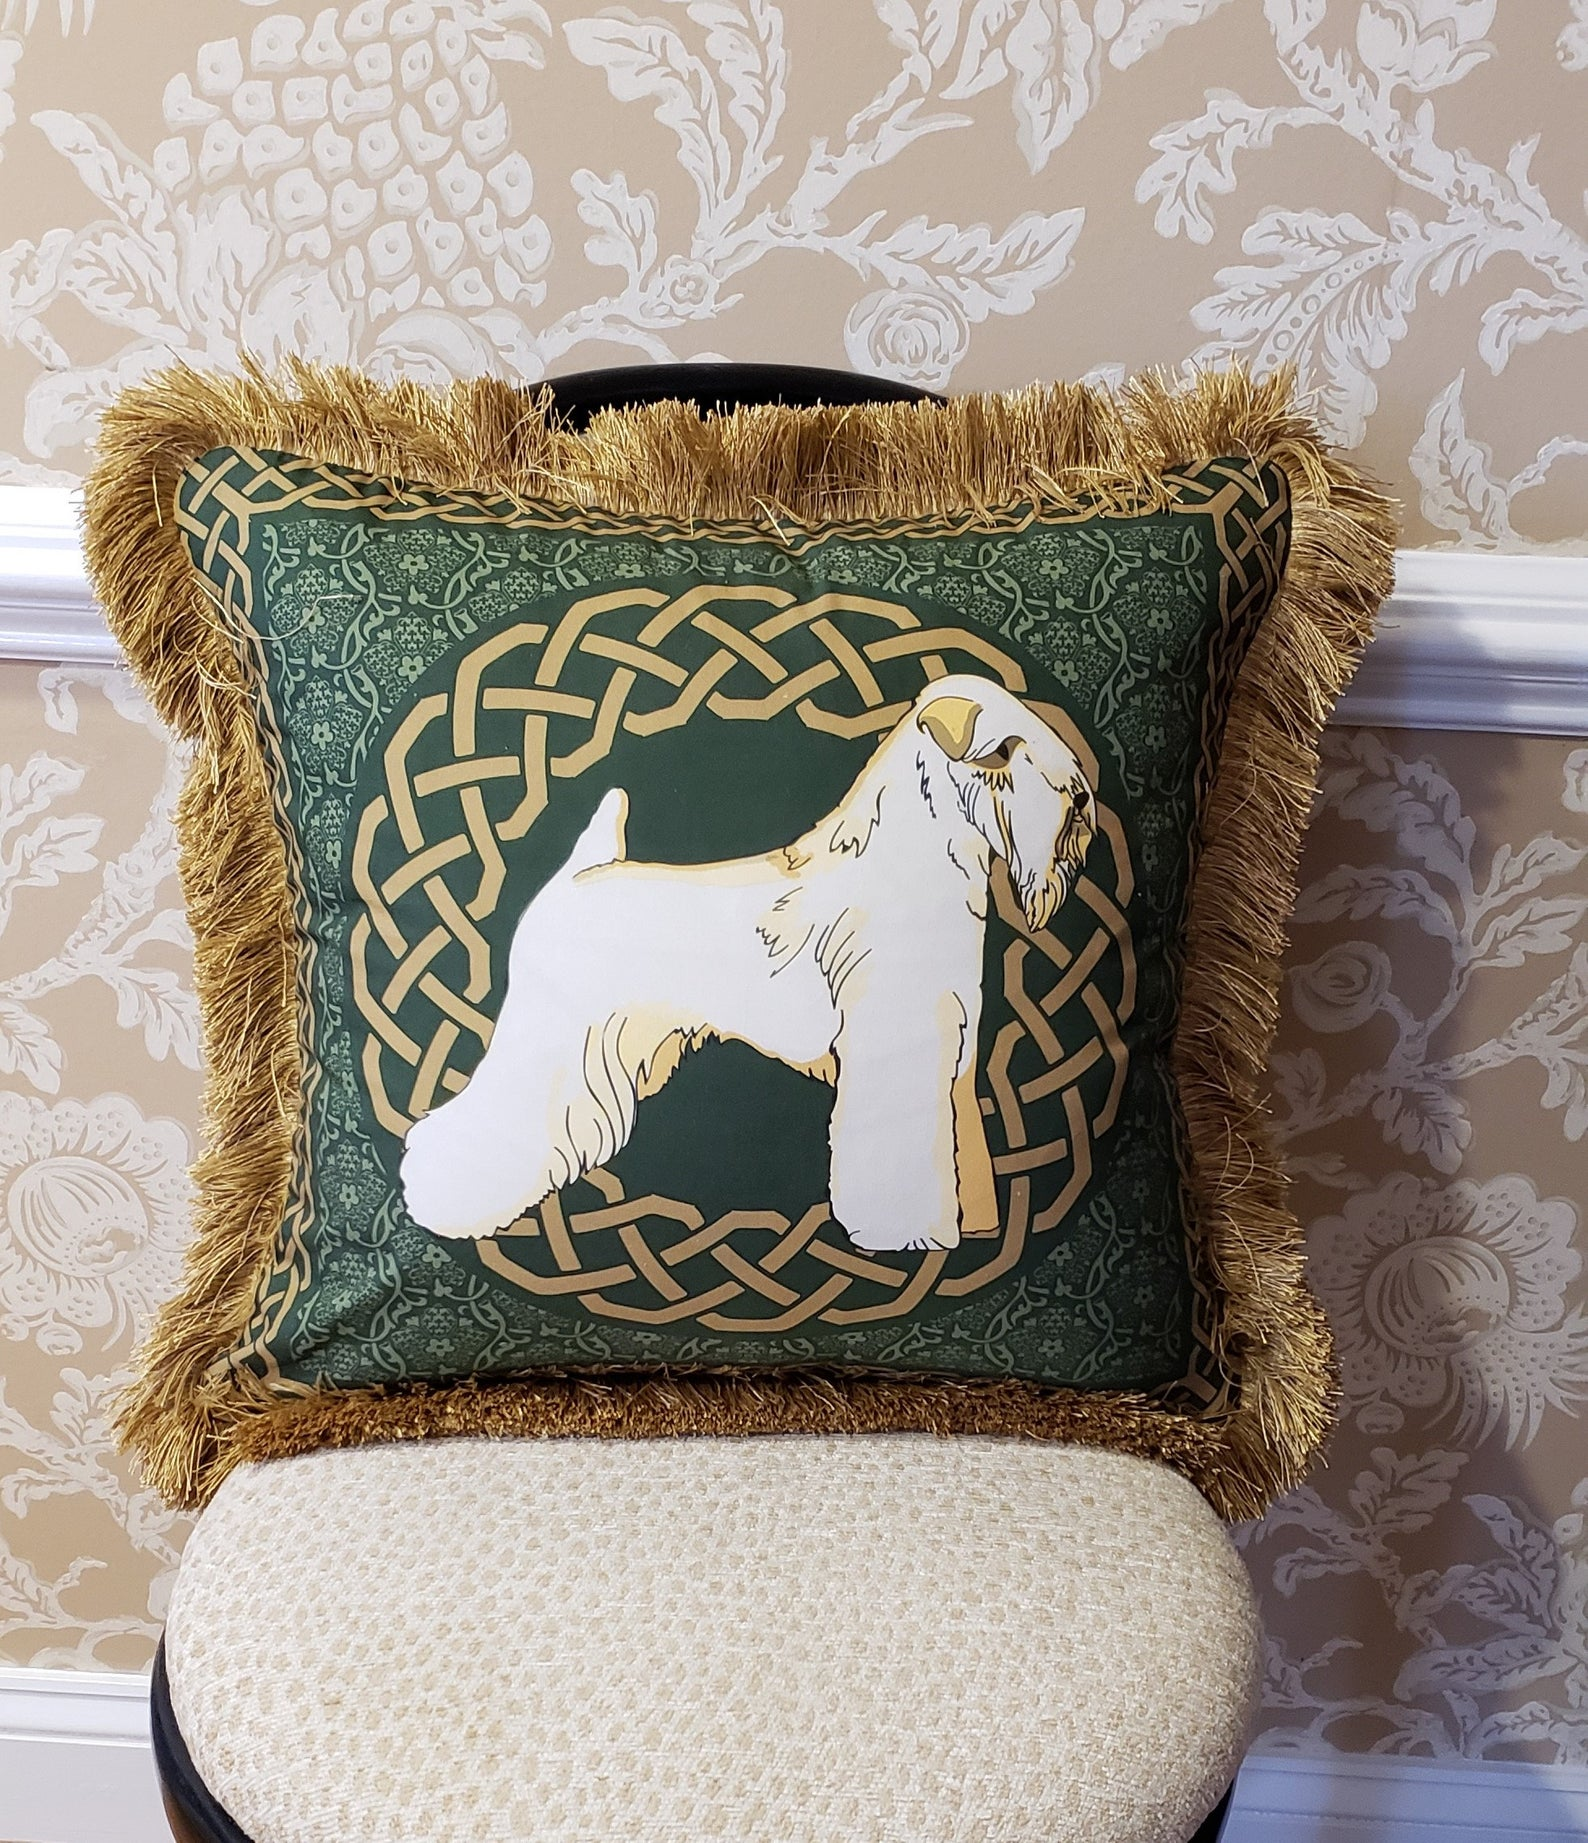 Soft Coated Wheaten Terrier Pillow $80